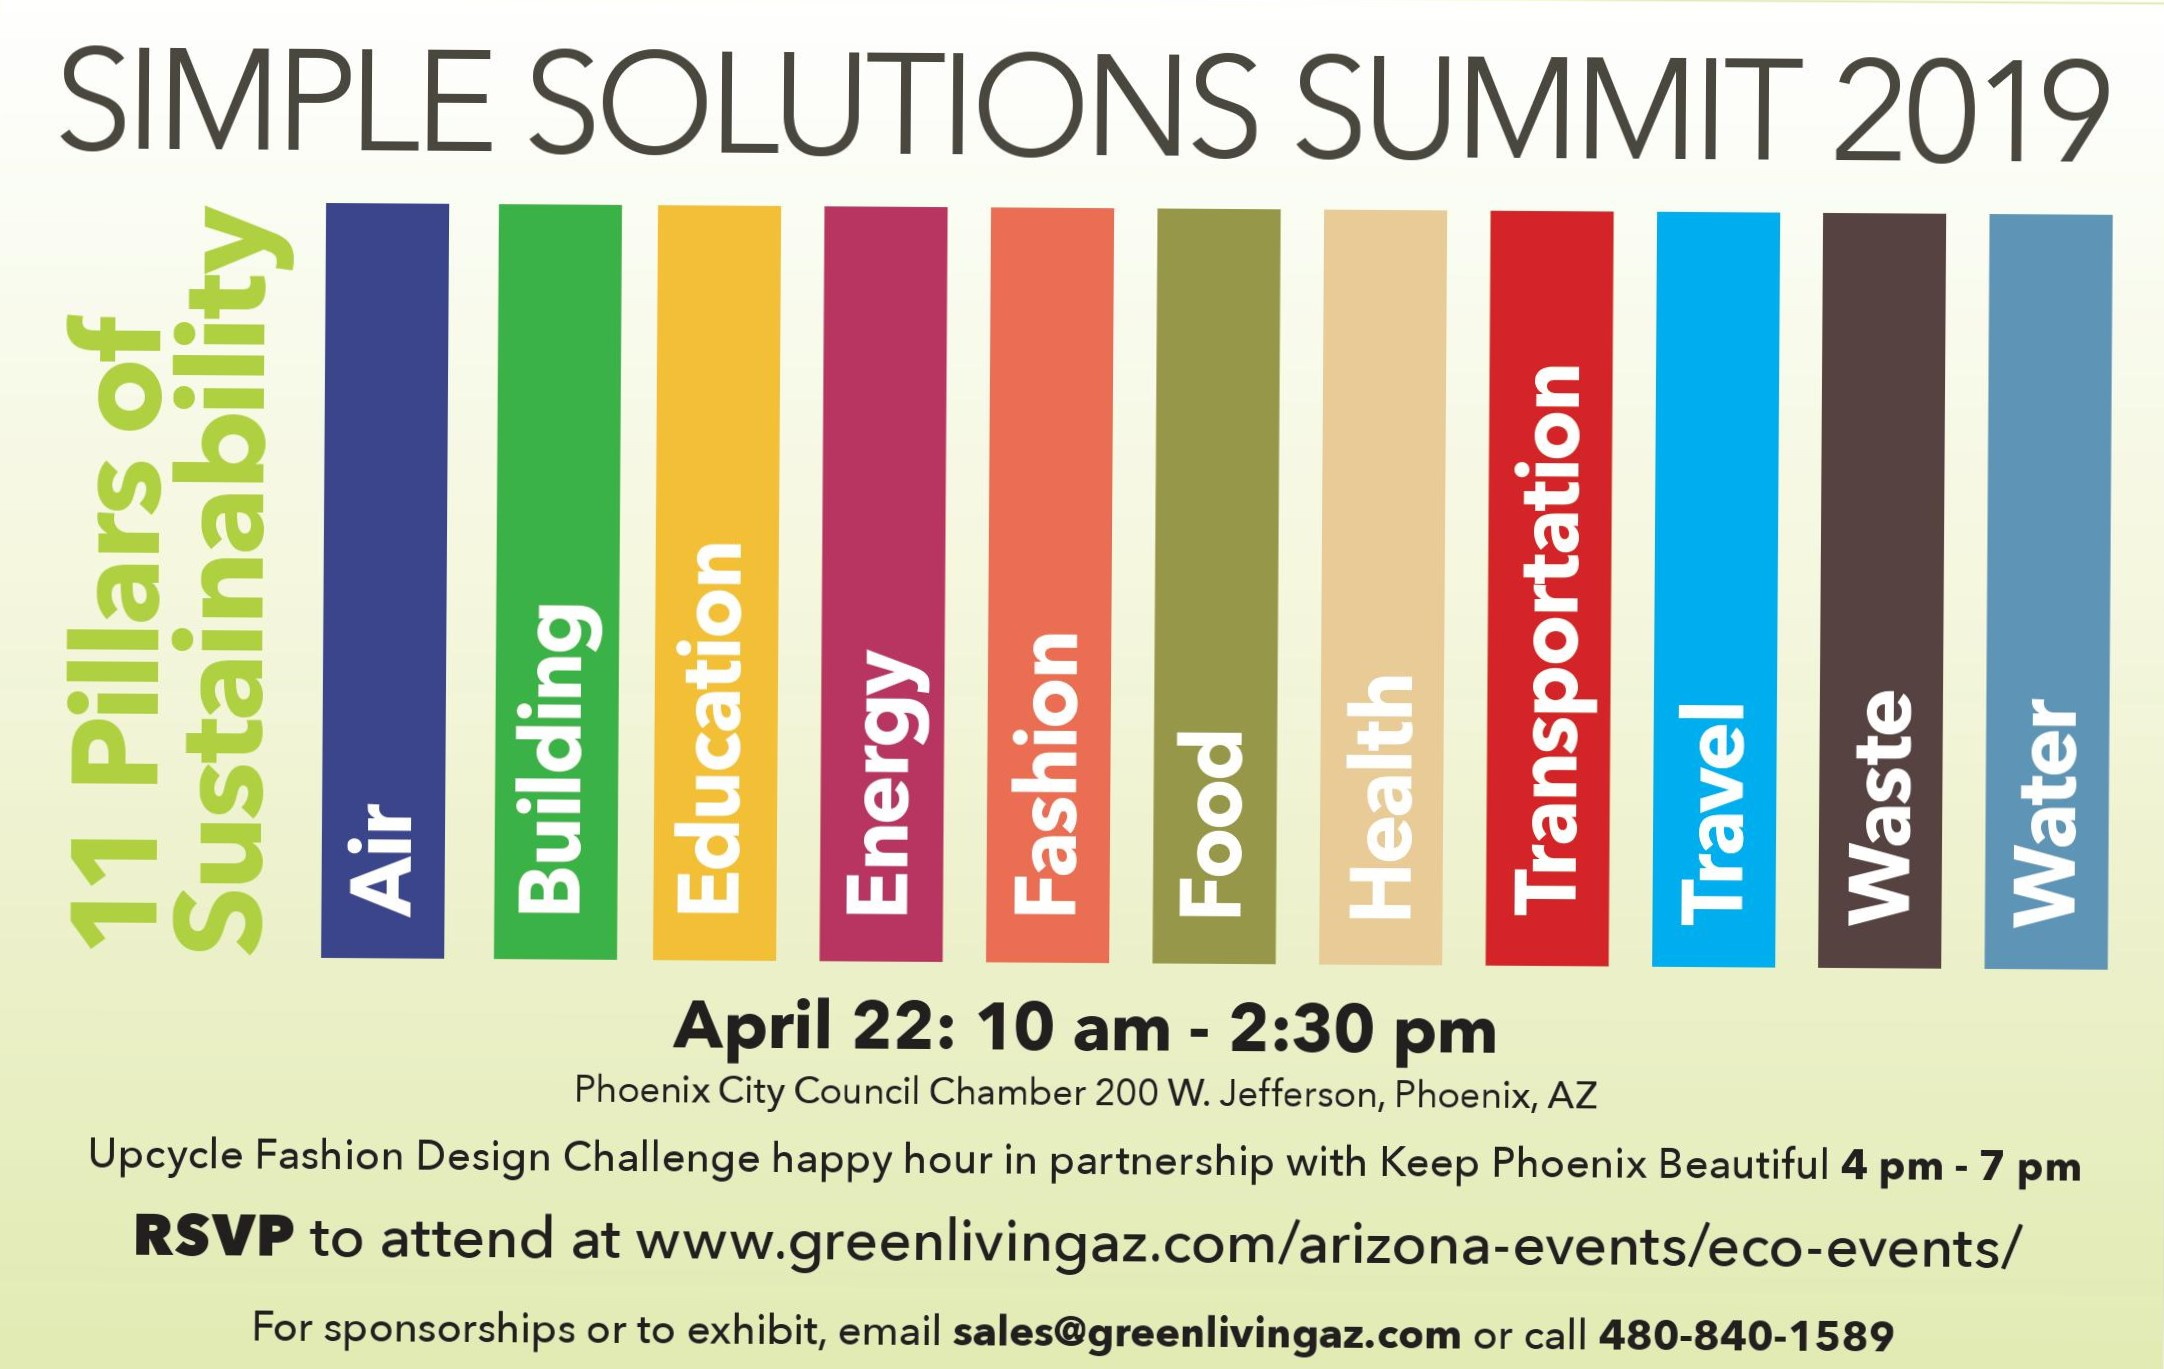 Simple Solutions Summit 2019 promo